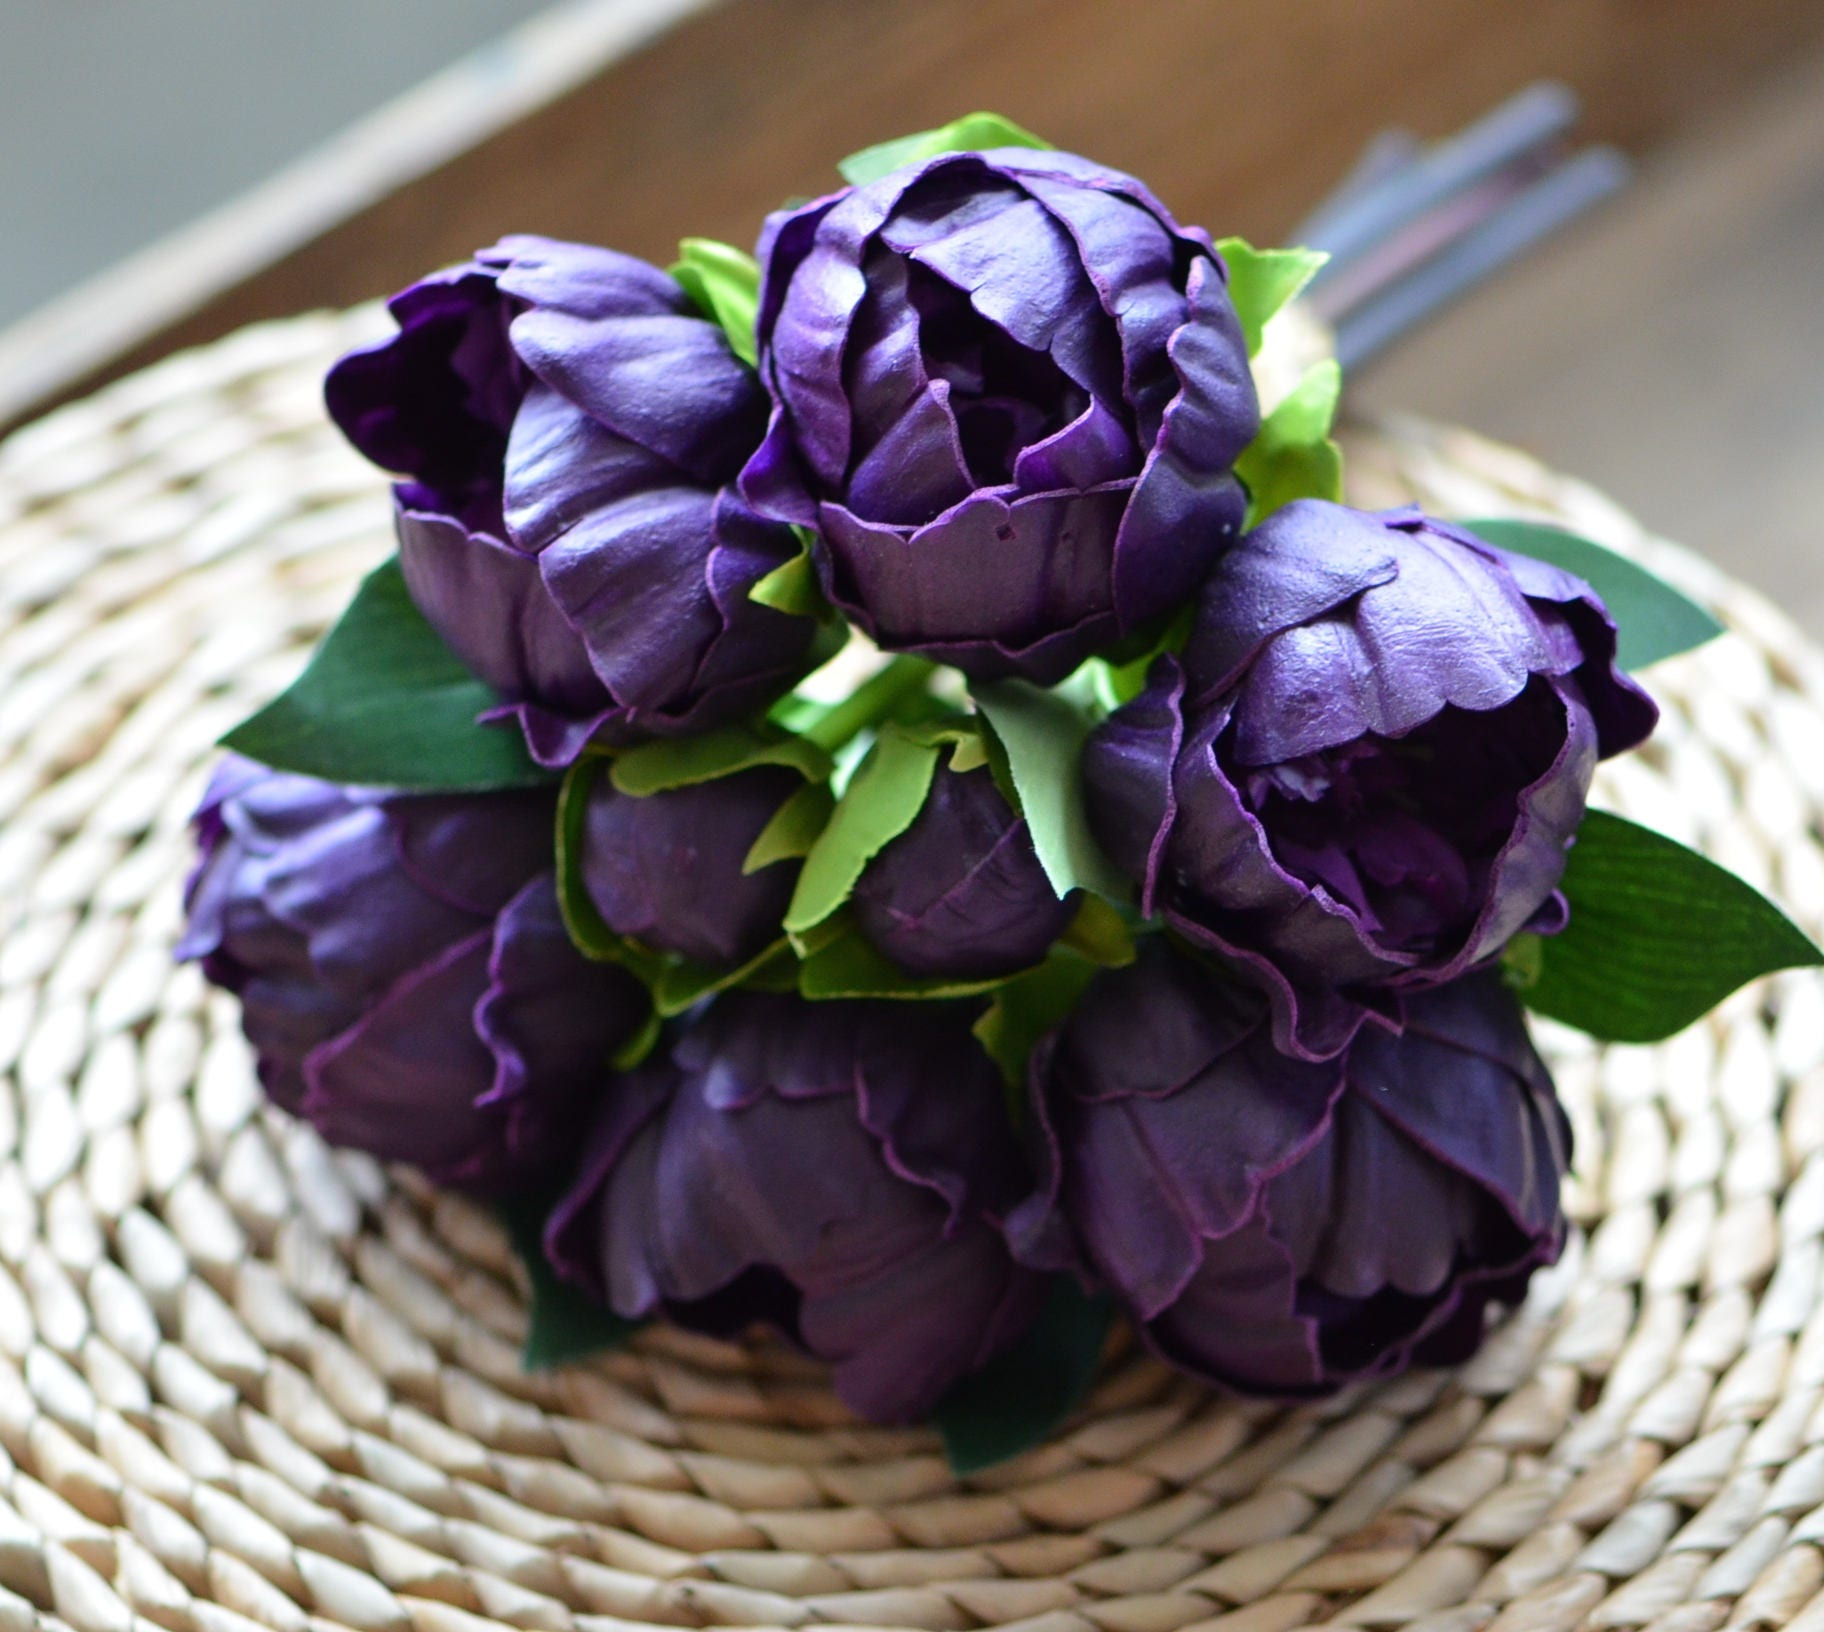 Eggplant Plum Purple Peonies Real Touch Peonies Bunch Diy Silk Etsy